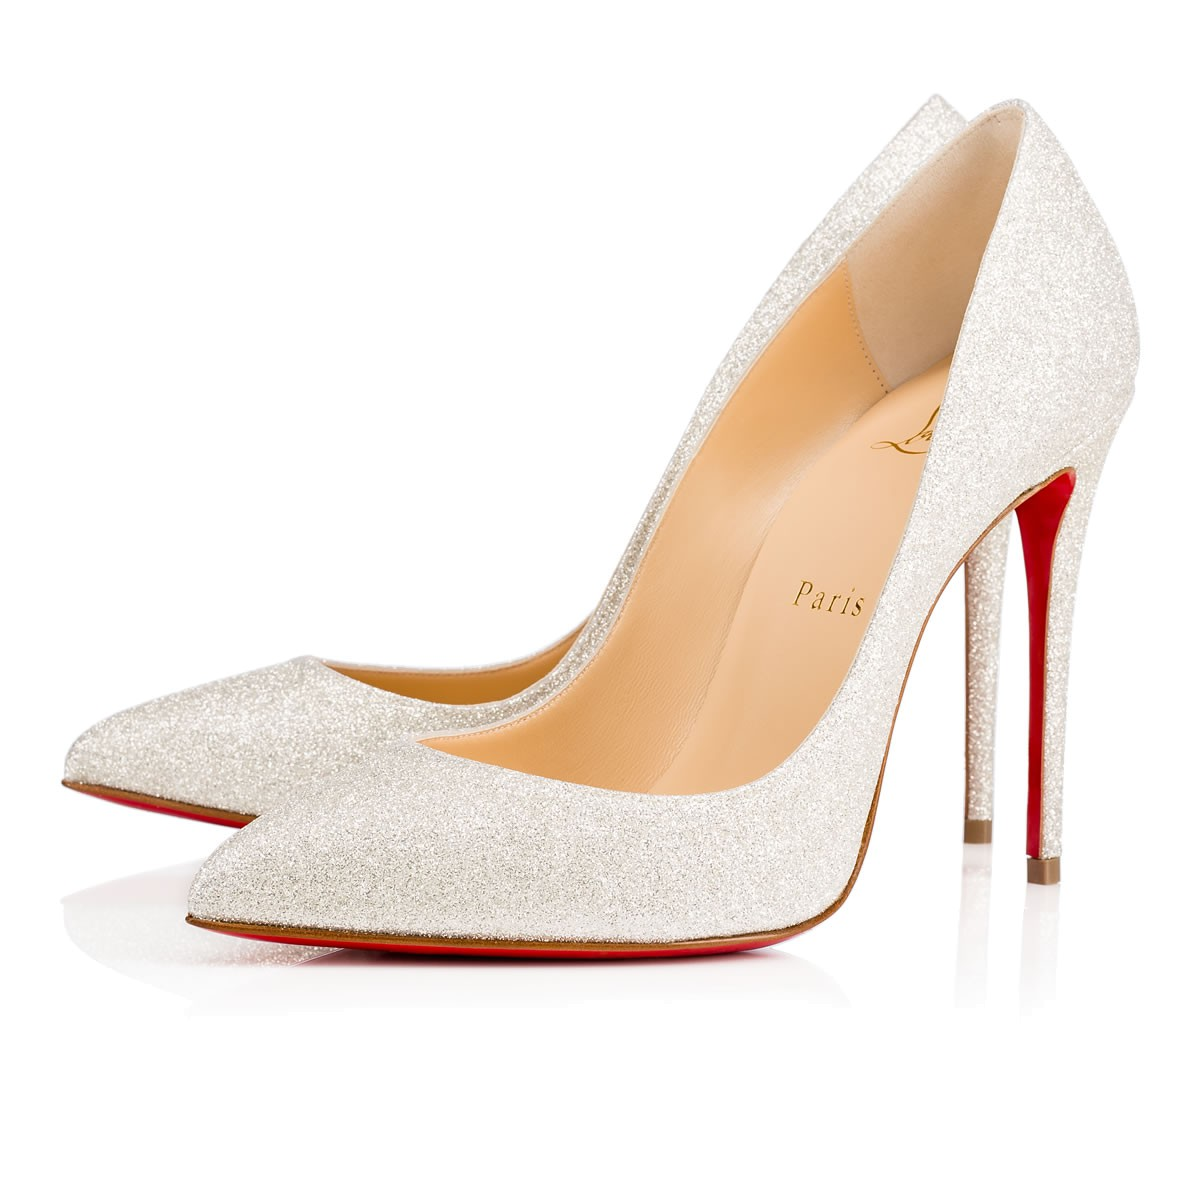 glitter wedding shoes photo - 1